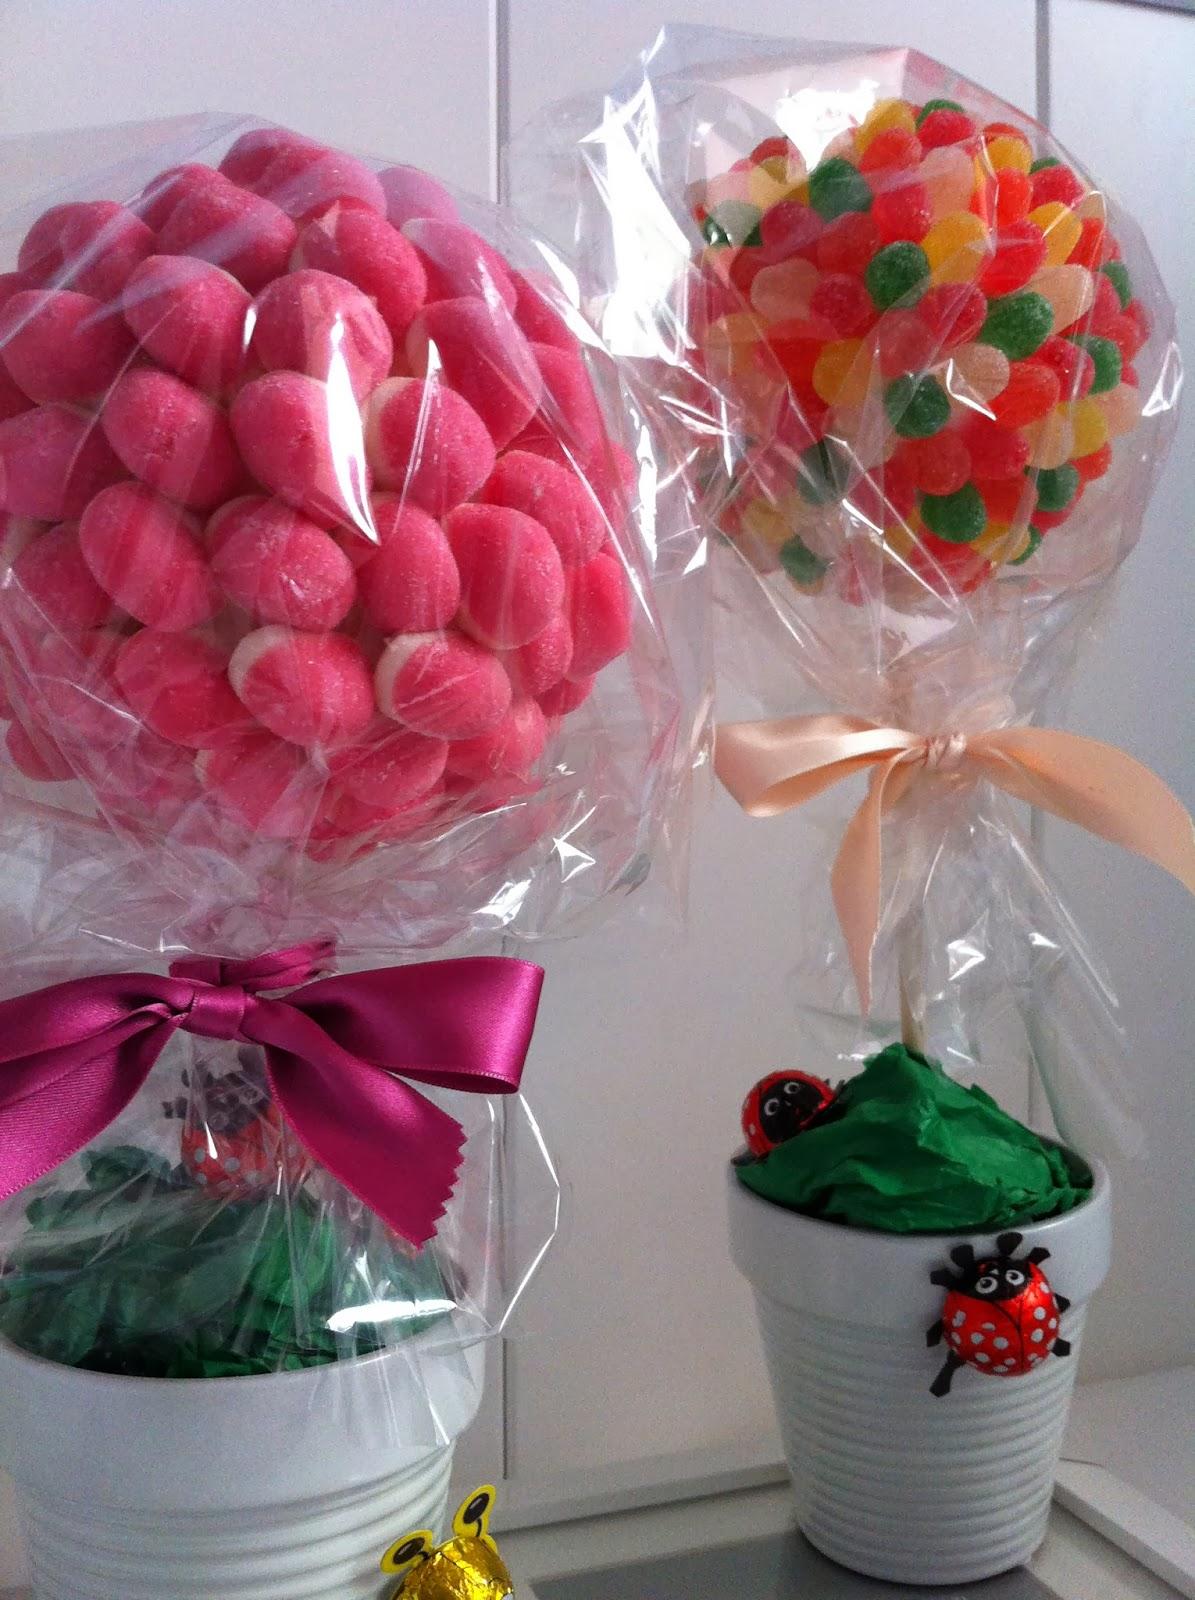 Arboles de chuches candy trees entre papeles y galletas - Decoracion con chuches ...